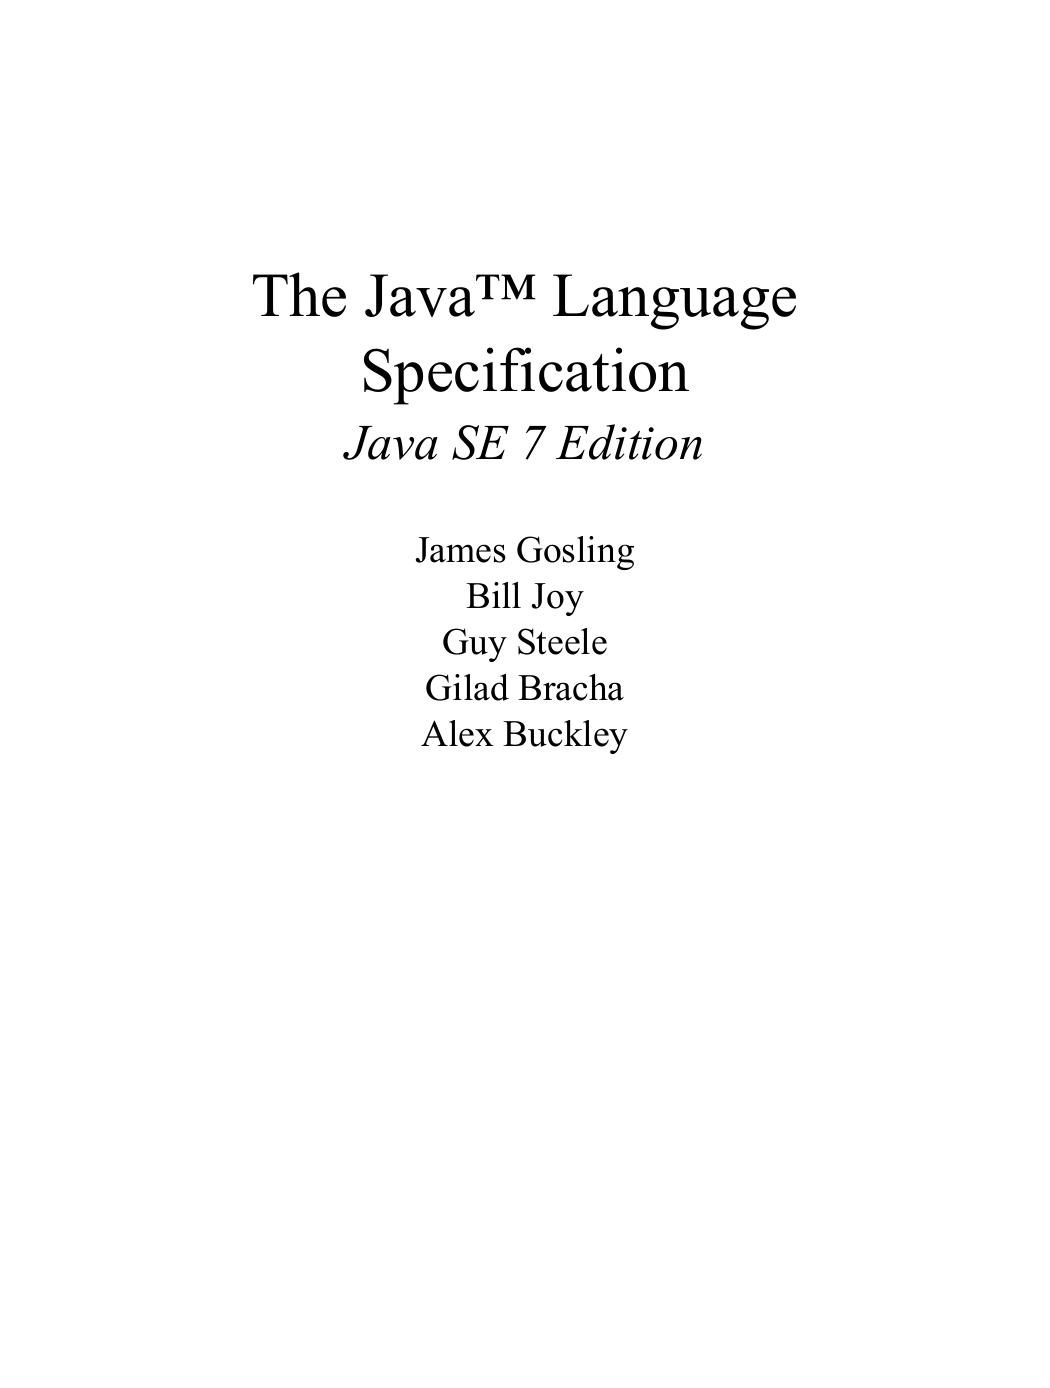 The Java™ Language Specification | manualzz com